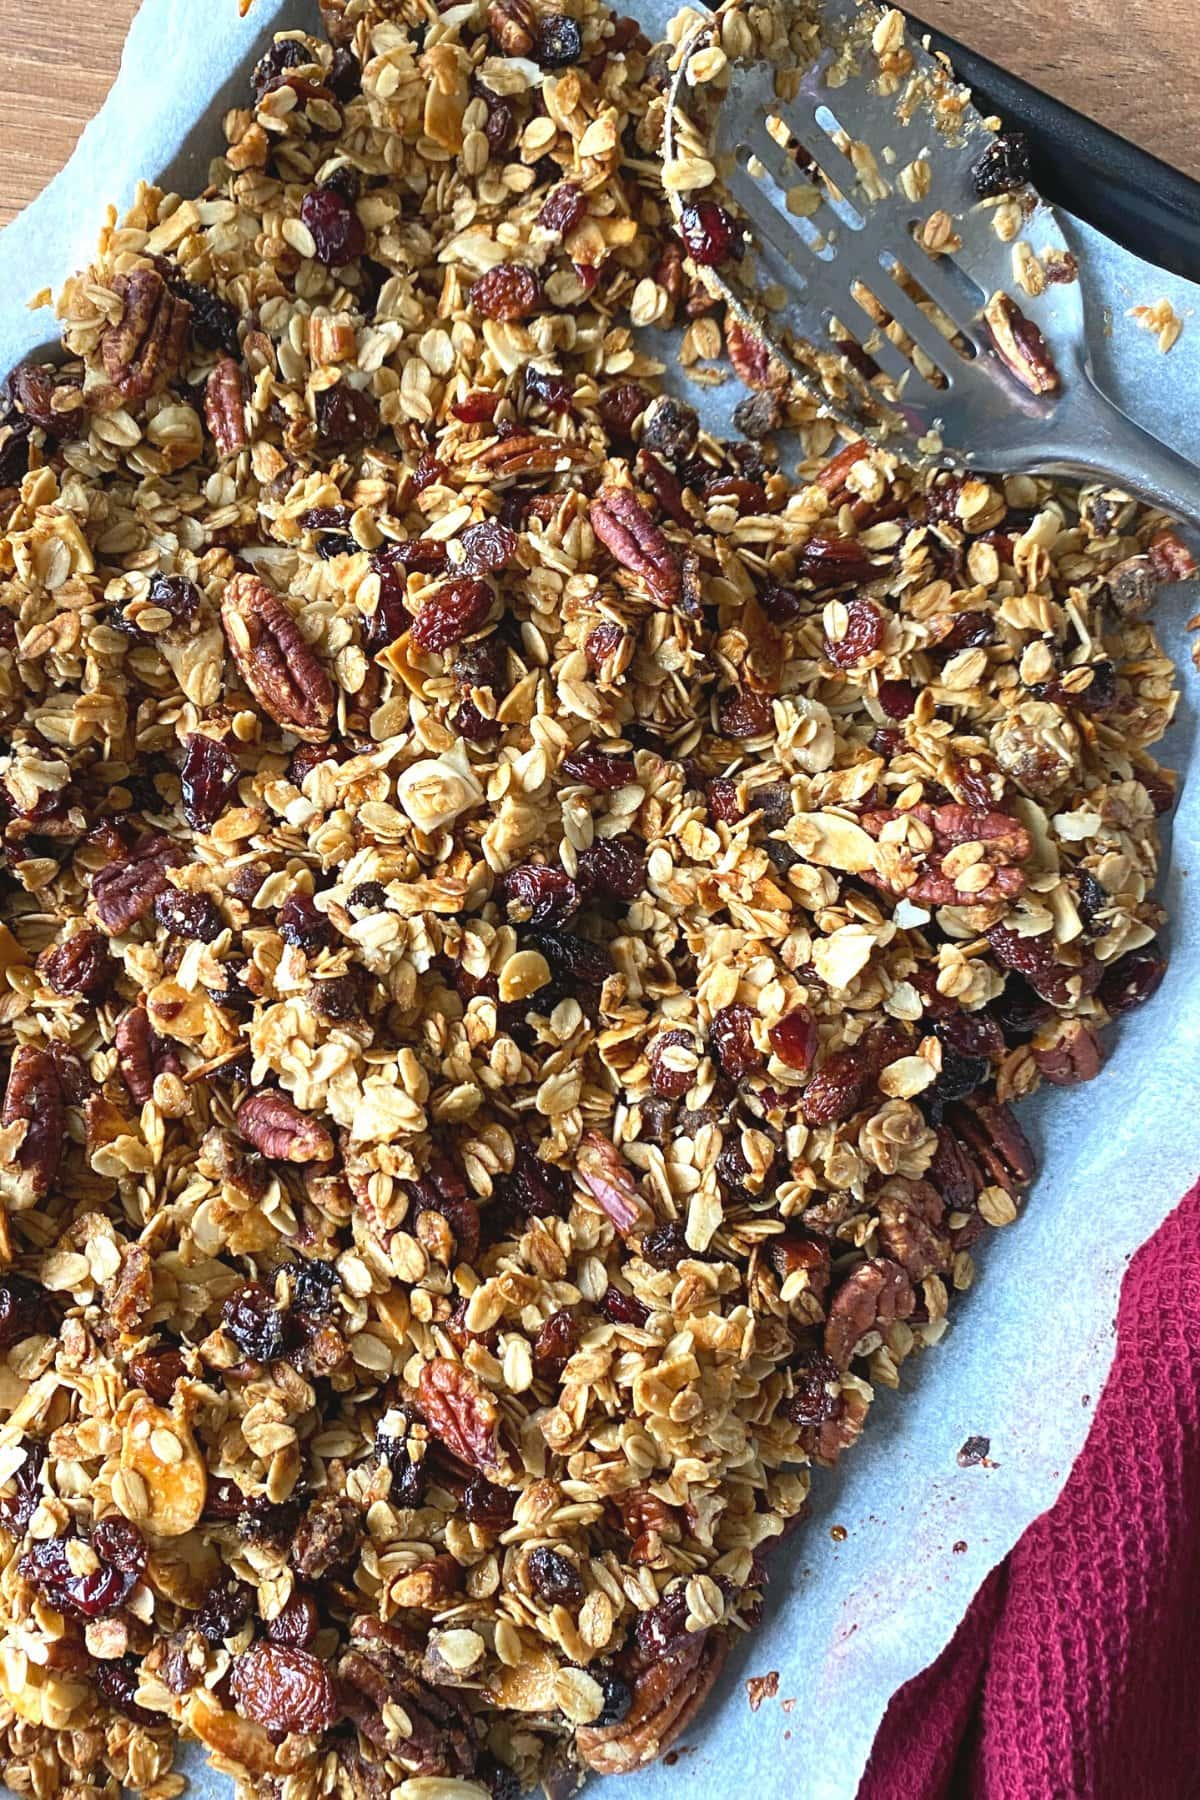 Granola baked